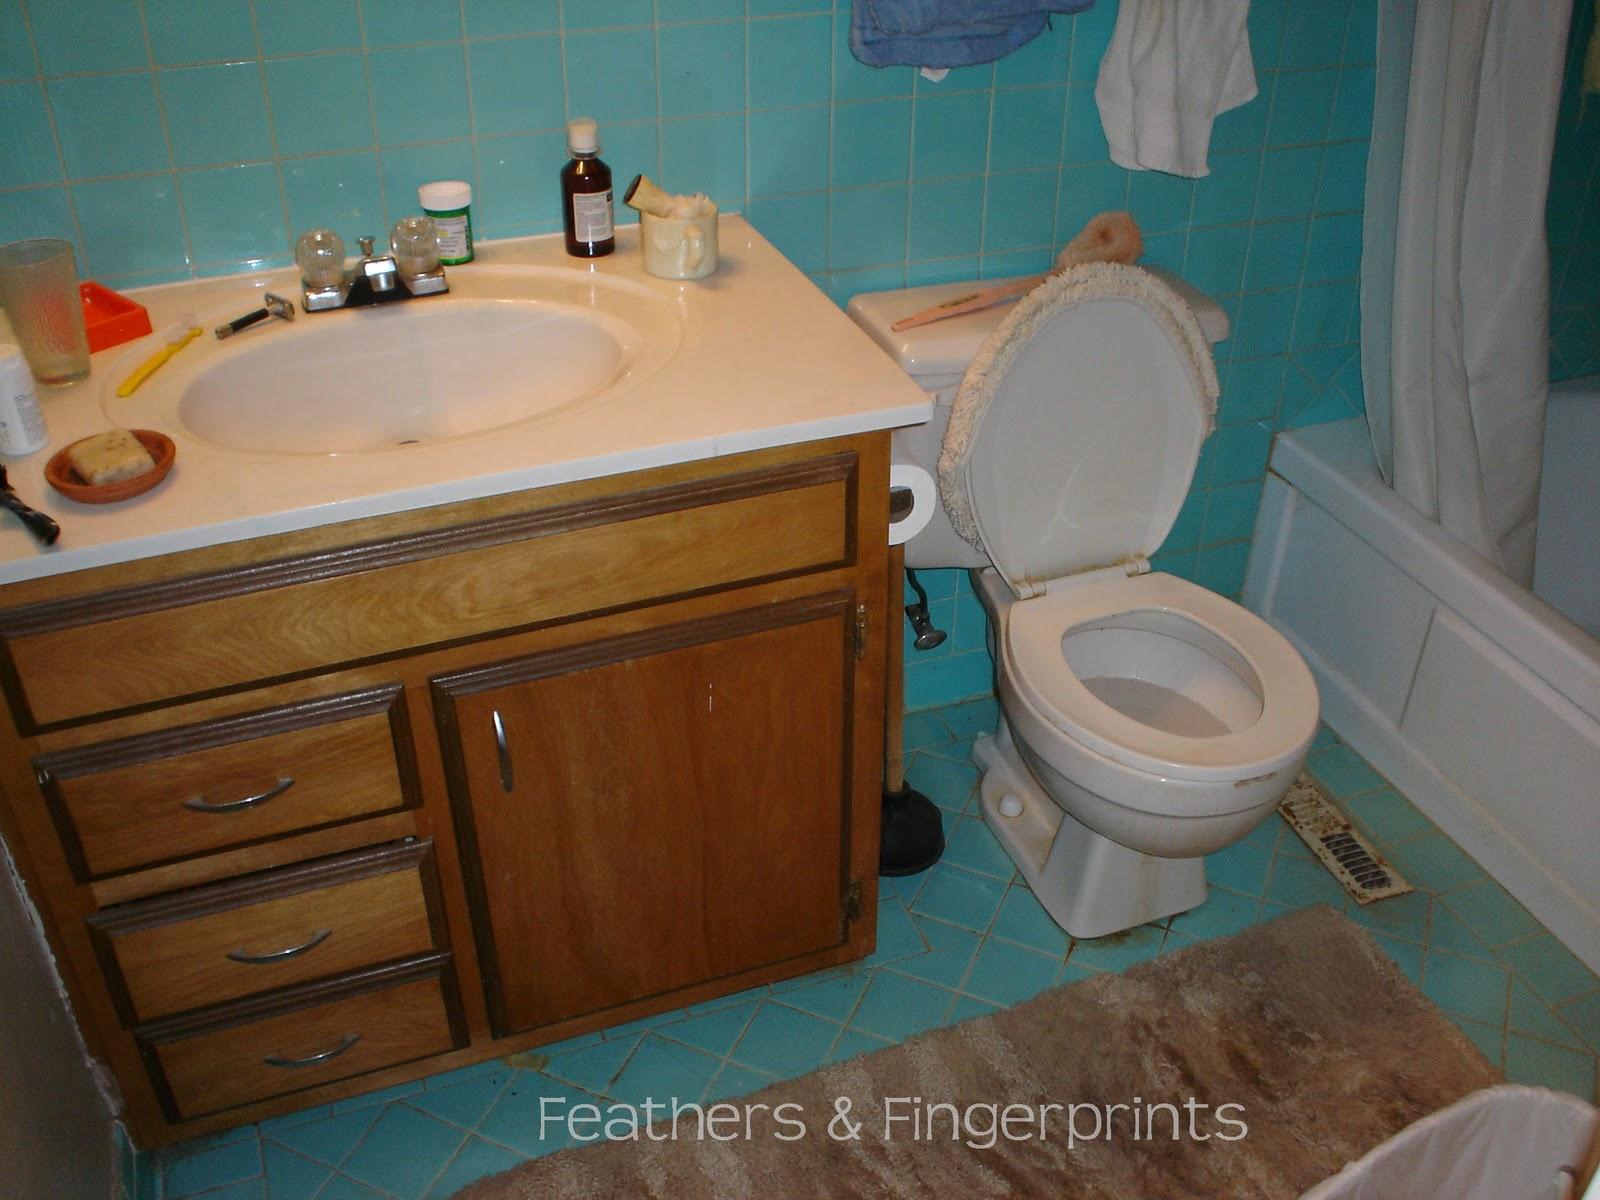 hd wallon  Wallpaper Behind Toilet